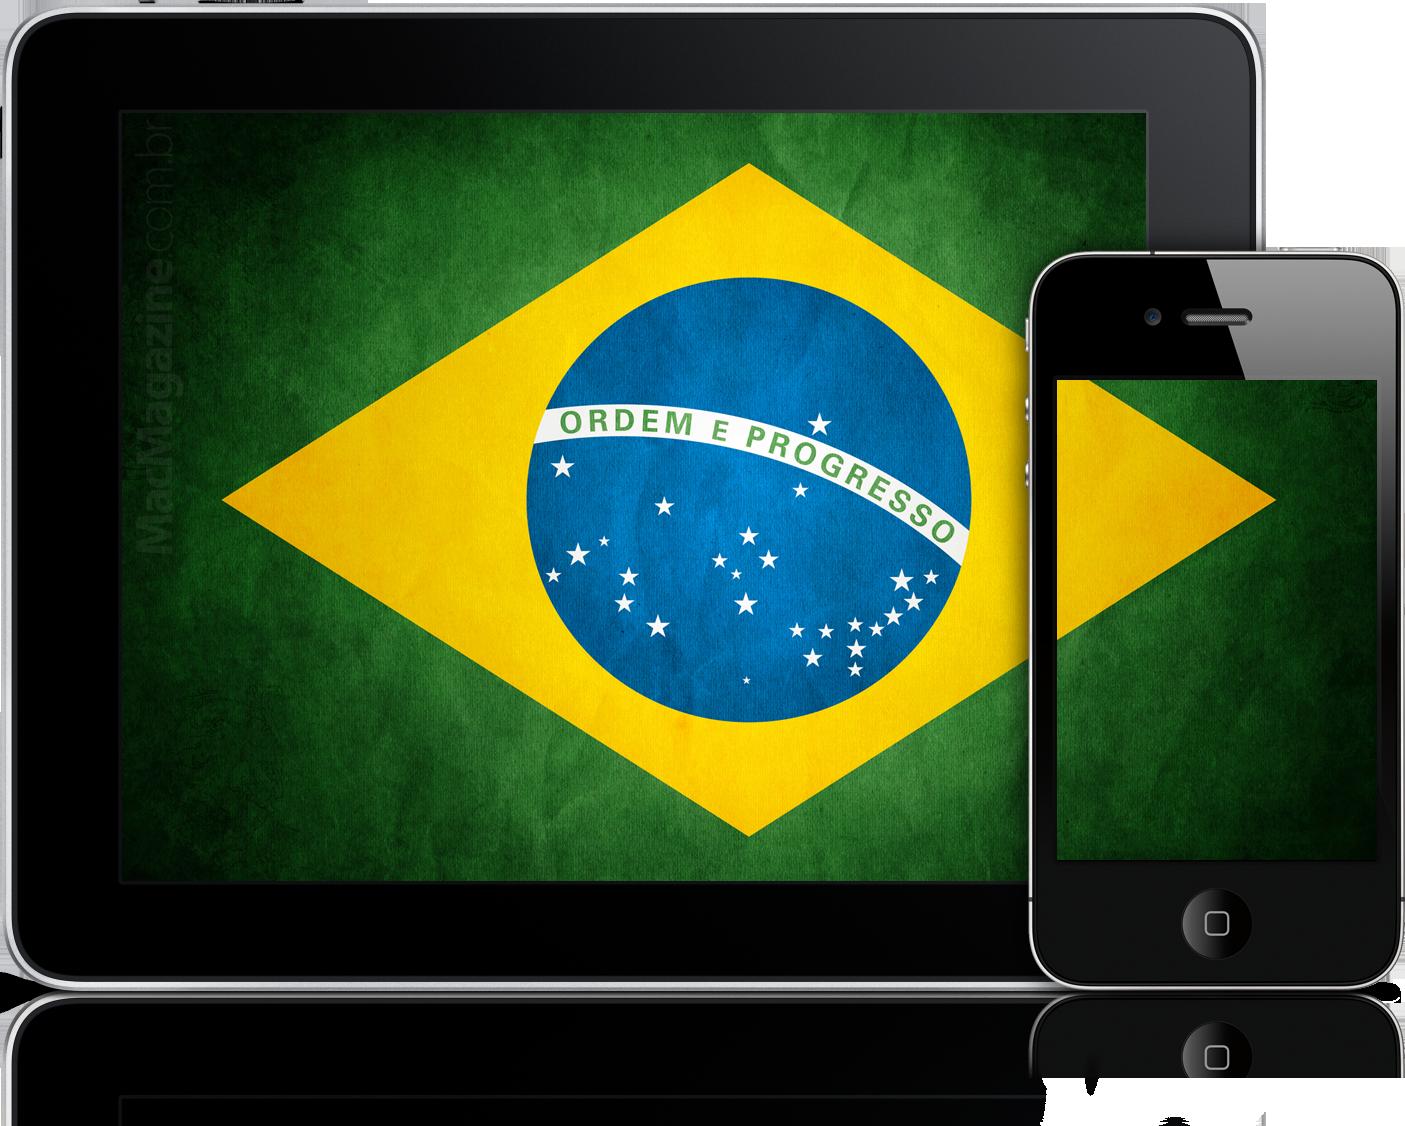 iPad e iPhone 4 com a bandeira do Brasil